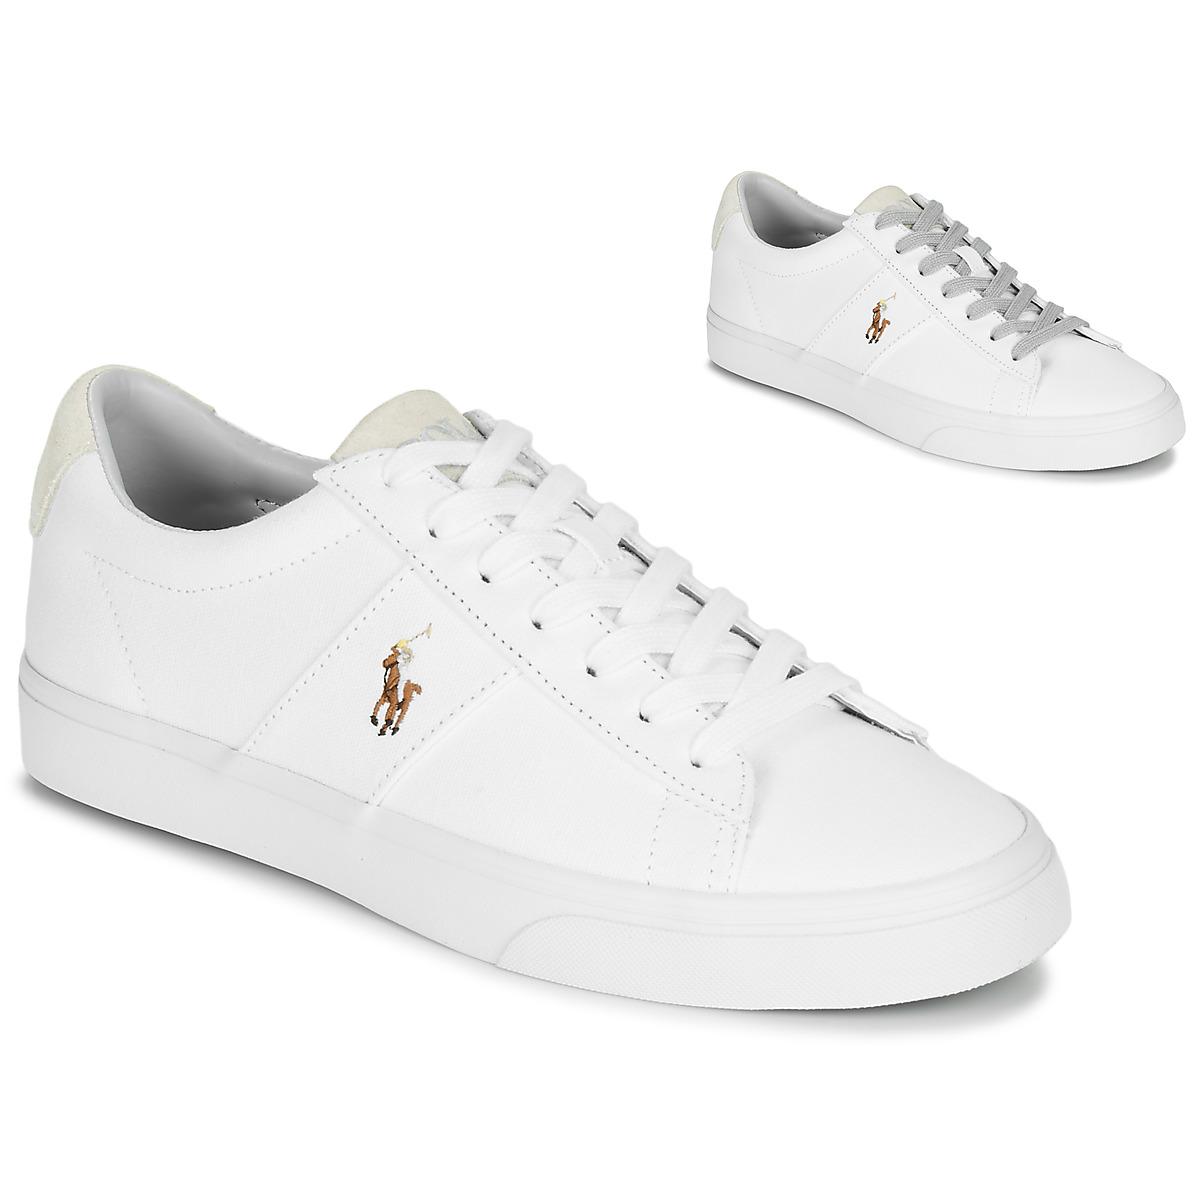 Polo Ralph Lauren SAYER White - Free